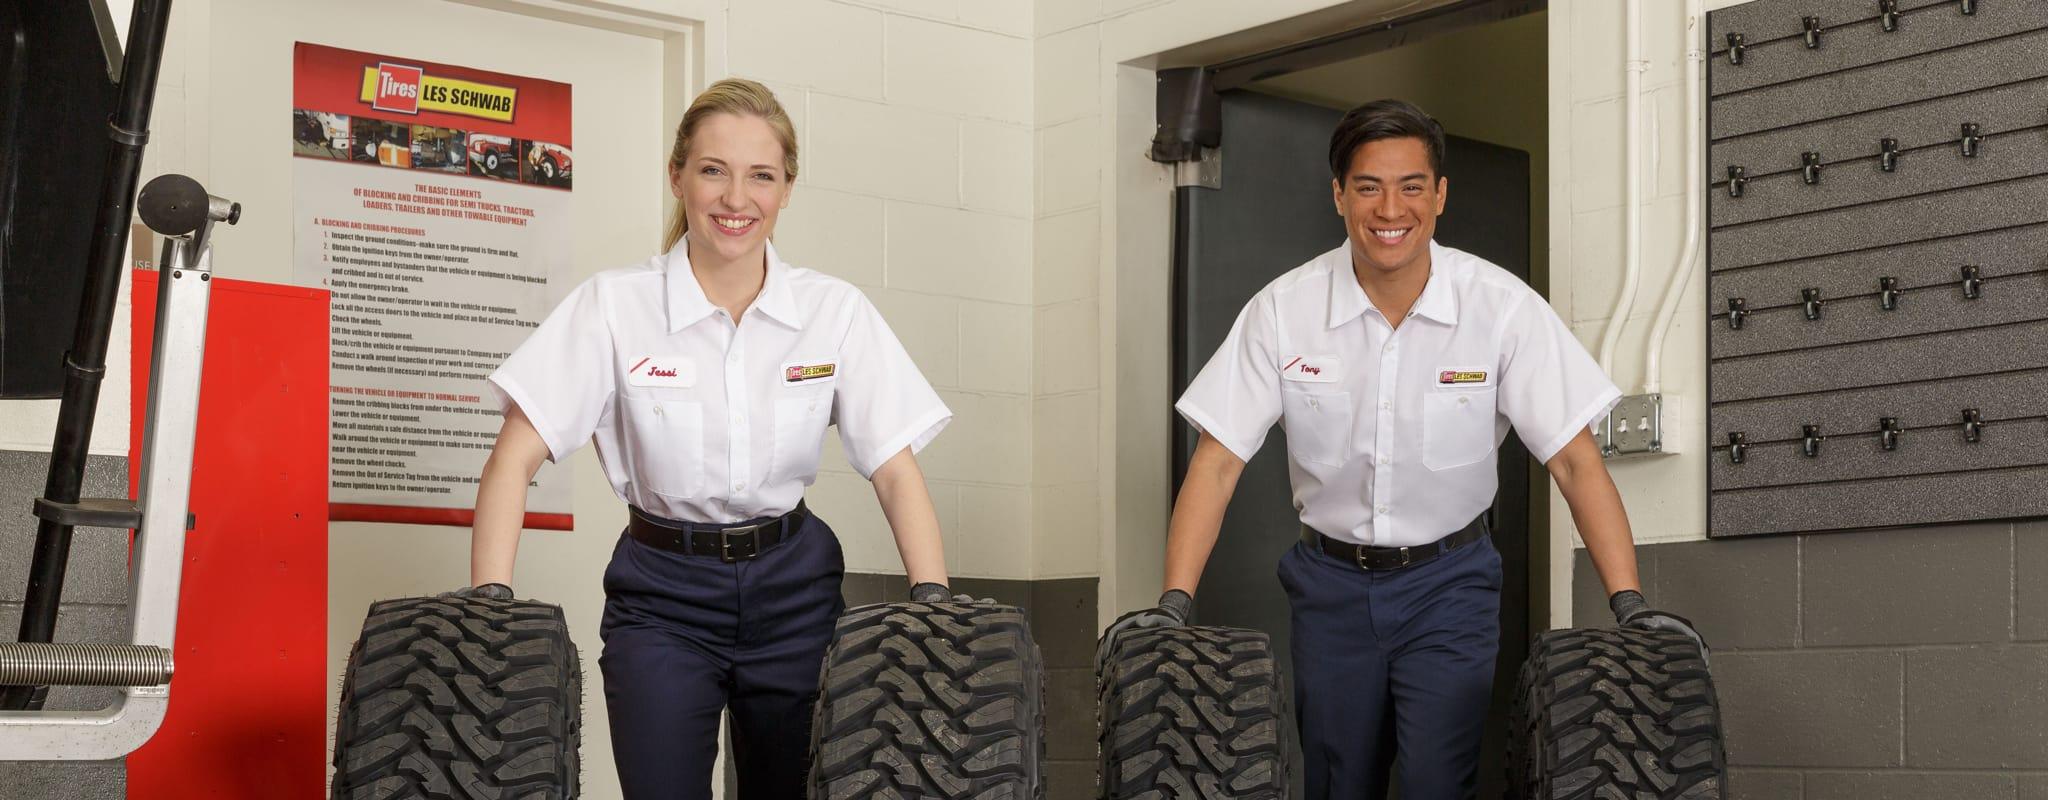 Two Les Schwab technicians rolling a set of truck tires across the floor.